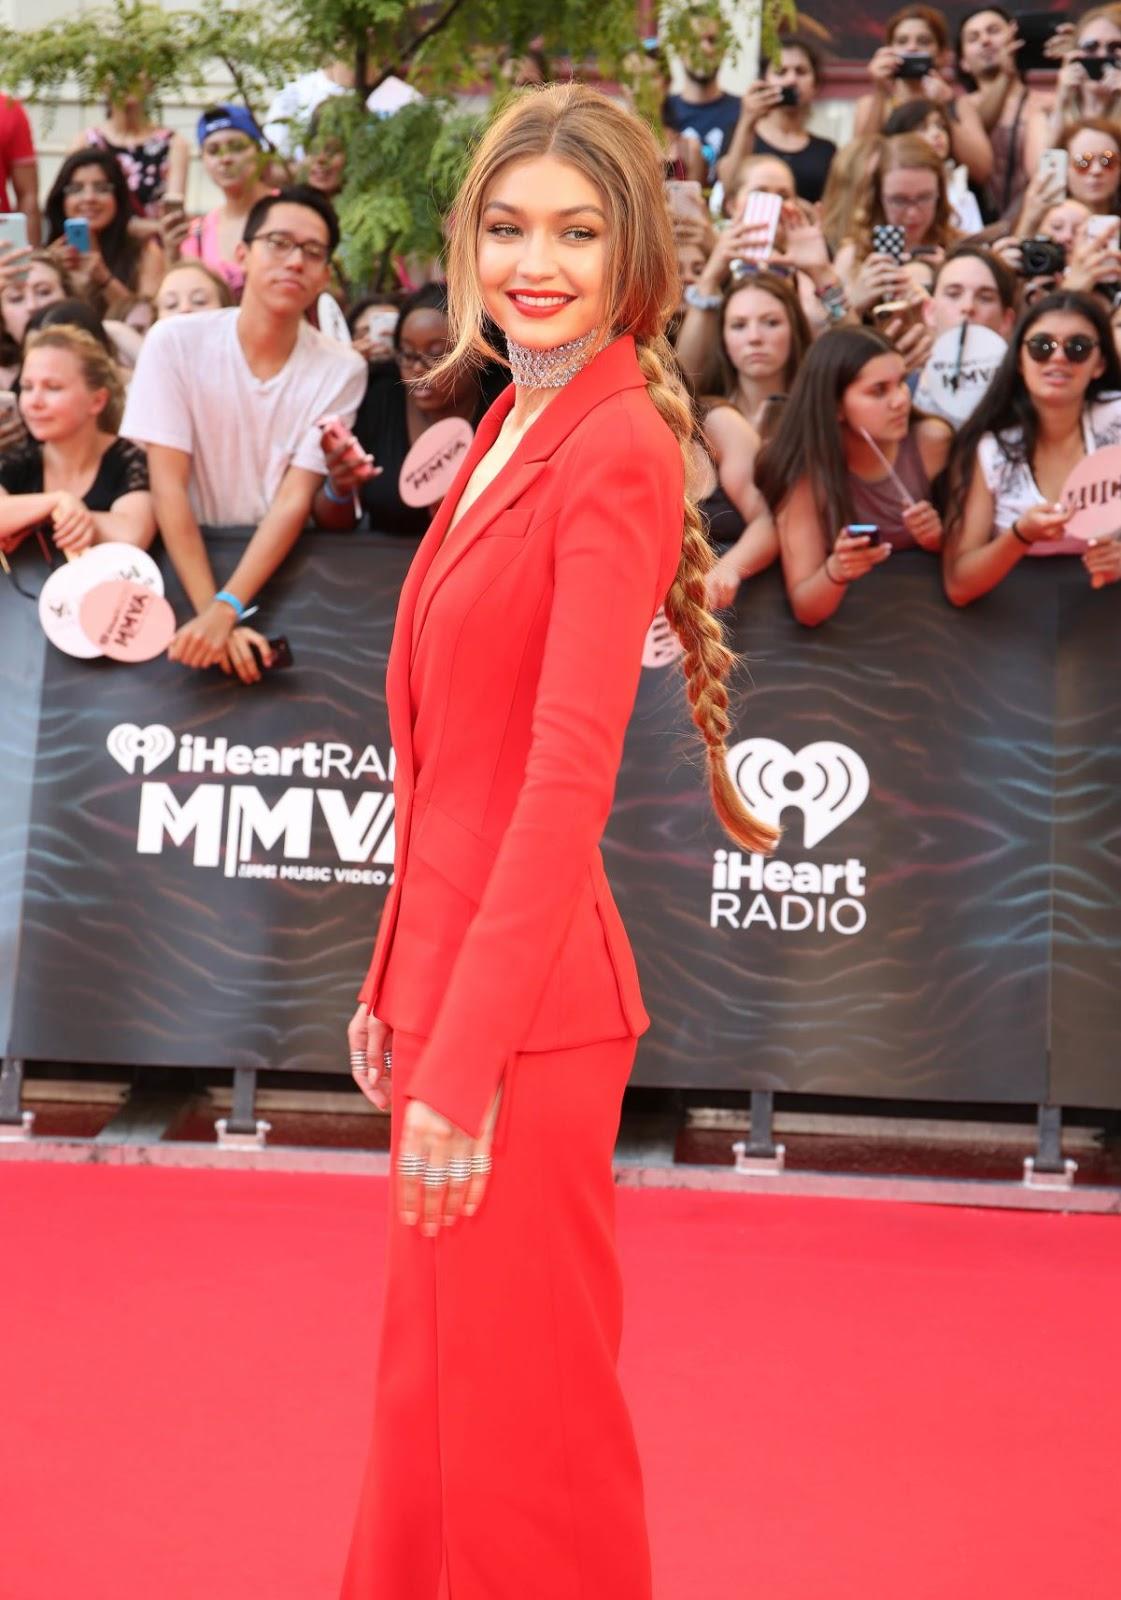 HD Photos of Gigi Hadid at iHeartRADIO MuchMusic Video Awards 2016 in Toronto, Canada